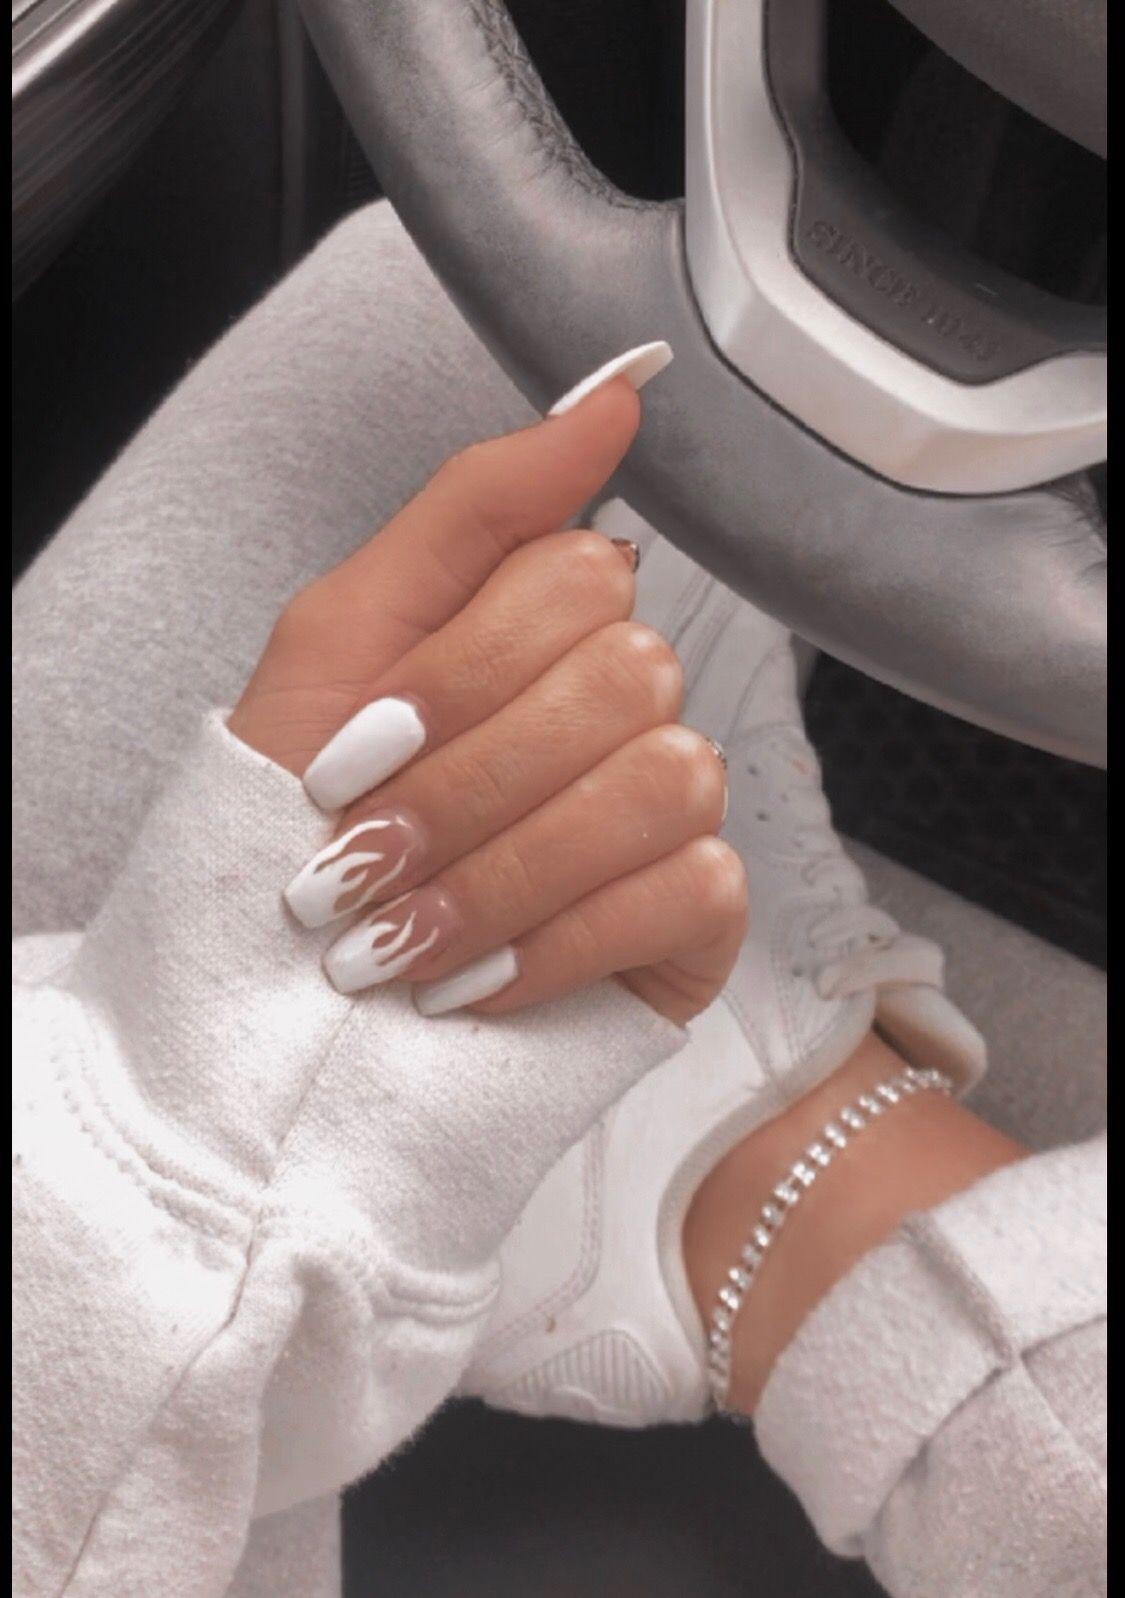 Gorg White Flame Nails In 2020 White Acrylic Nails Acrylic Nails Coffin Short Summer Acrylic Nails